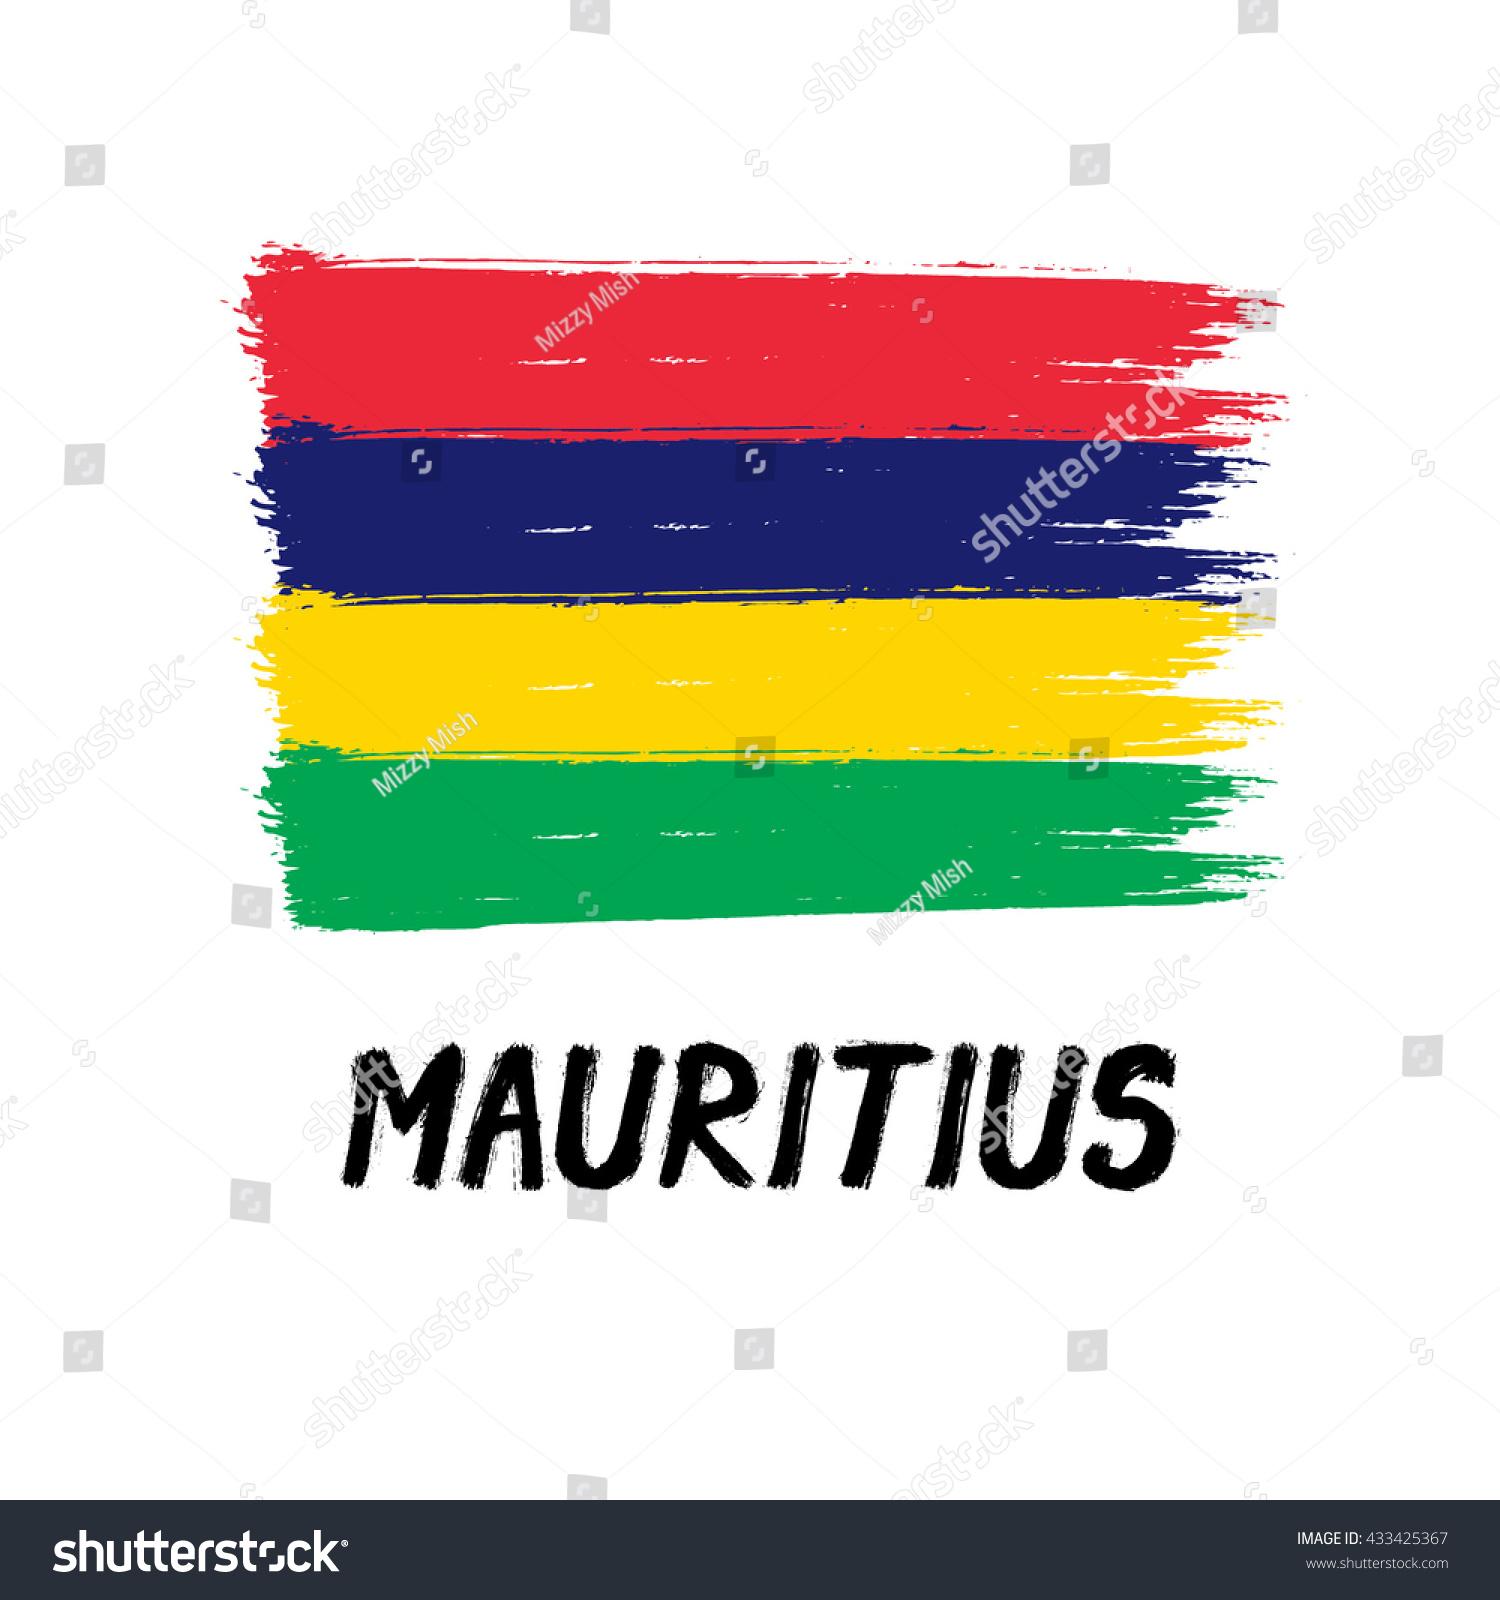 Flag Mauritius Grunge Stock Vector 433425367 - Shutterstock